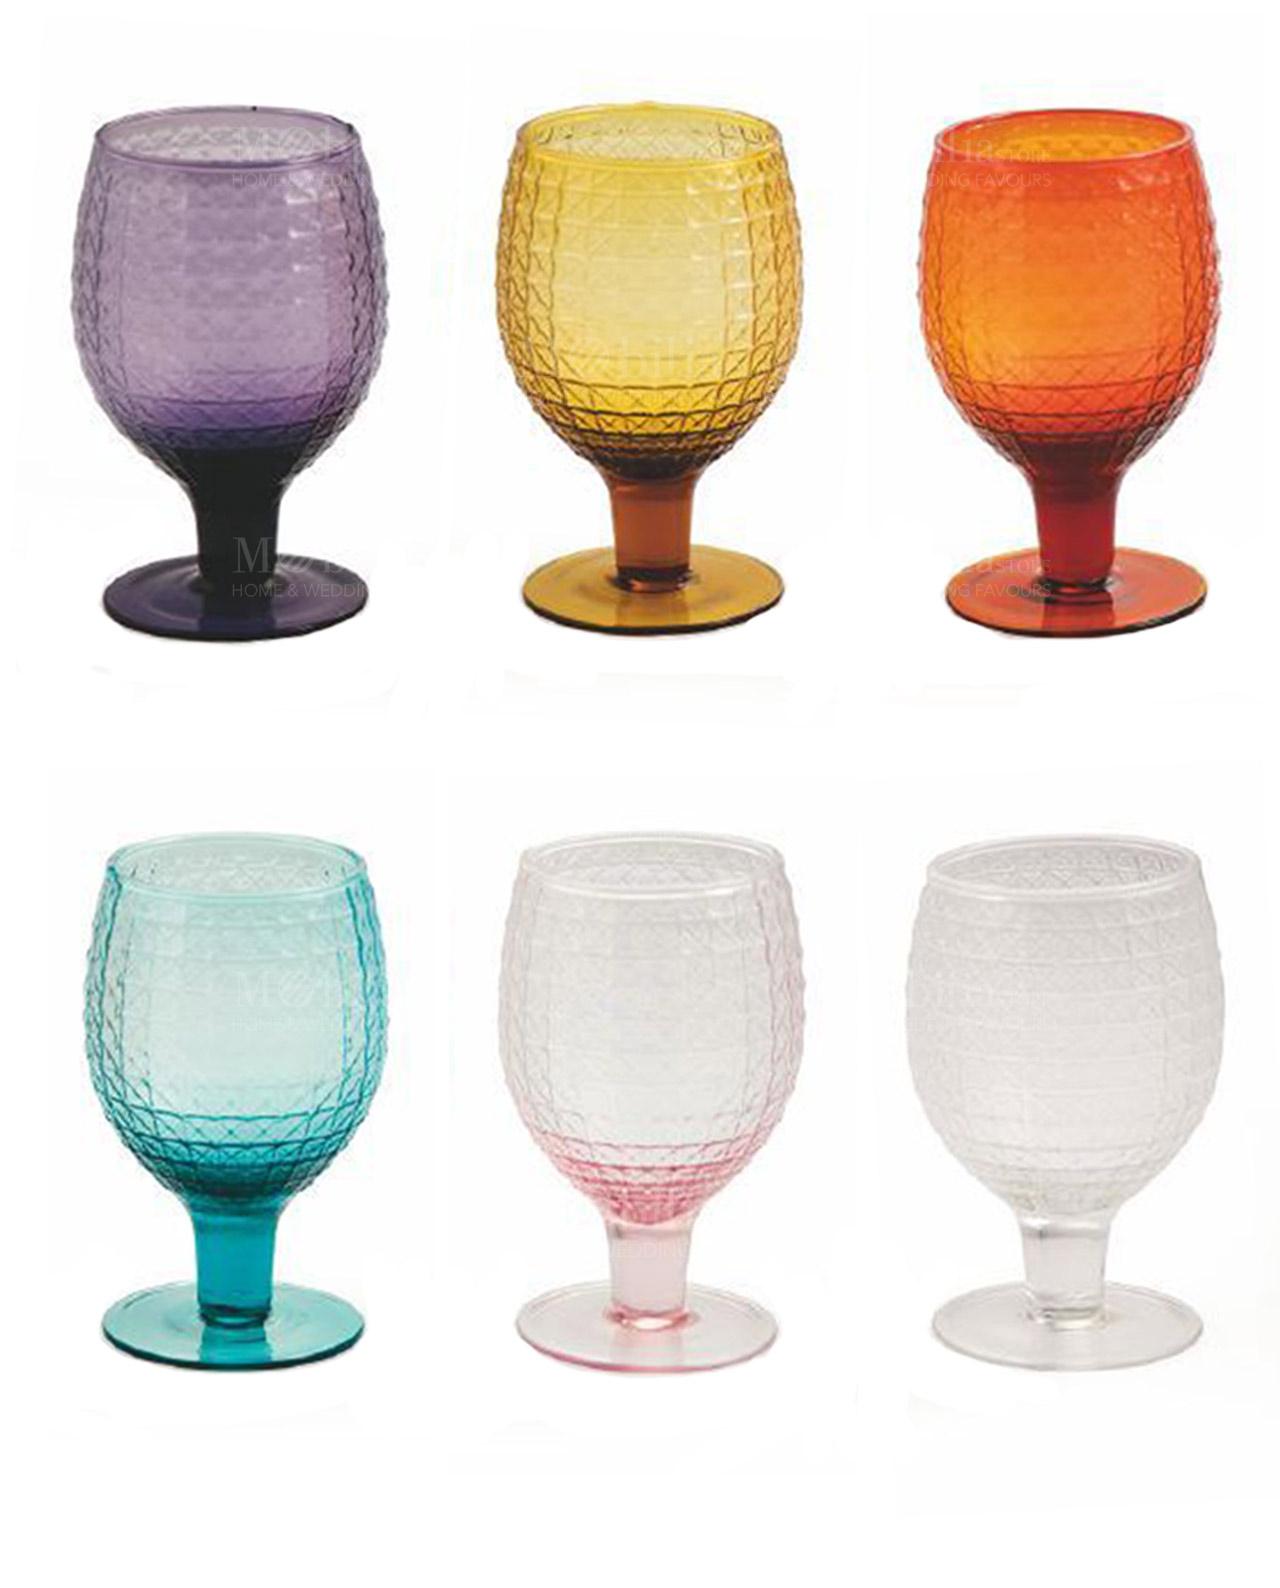 calici vino vetro colorati karma villa d 39 este set 6 pz